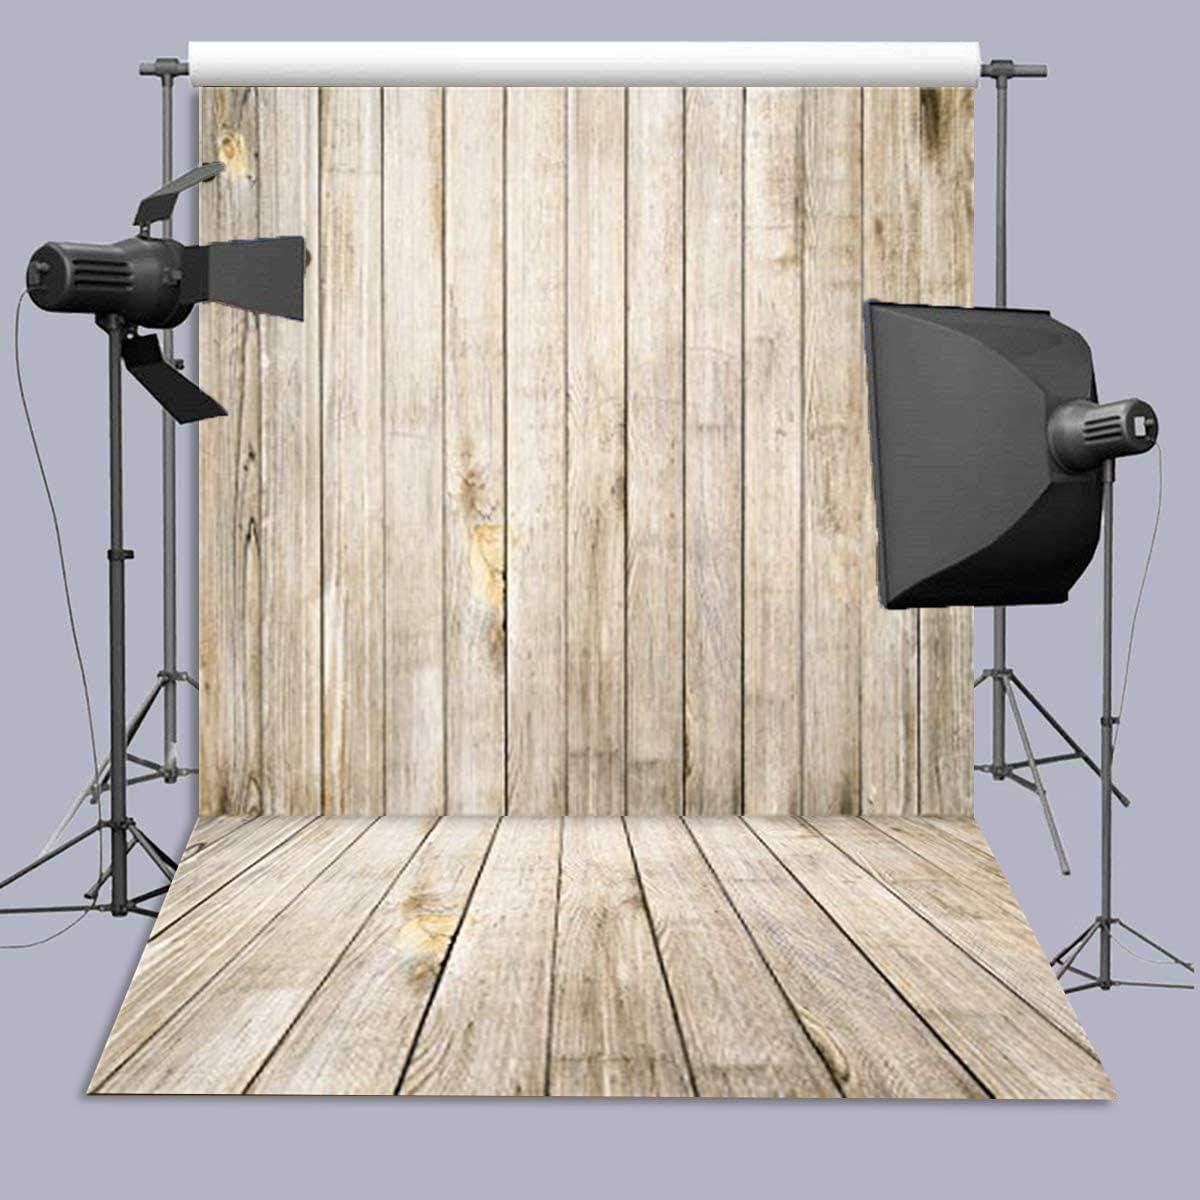 Photo Background for Baby Wooden Floor Photography Backdrops Suitable for Children Art Studio Vinyl 5x7FT QX508